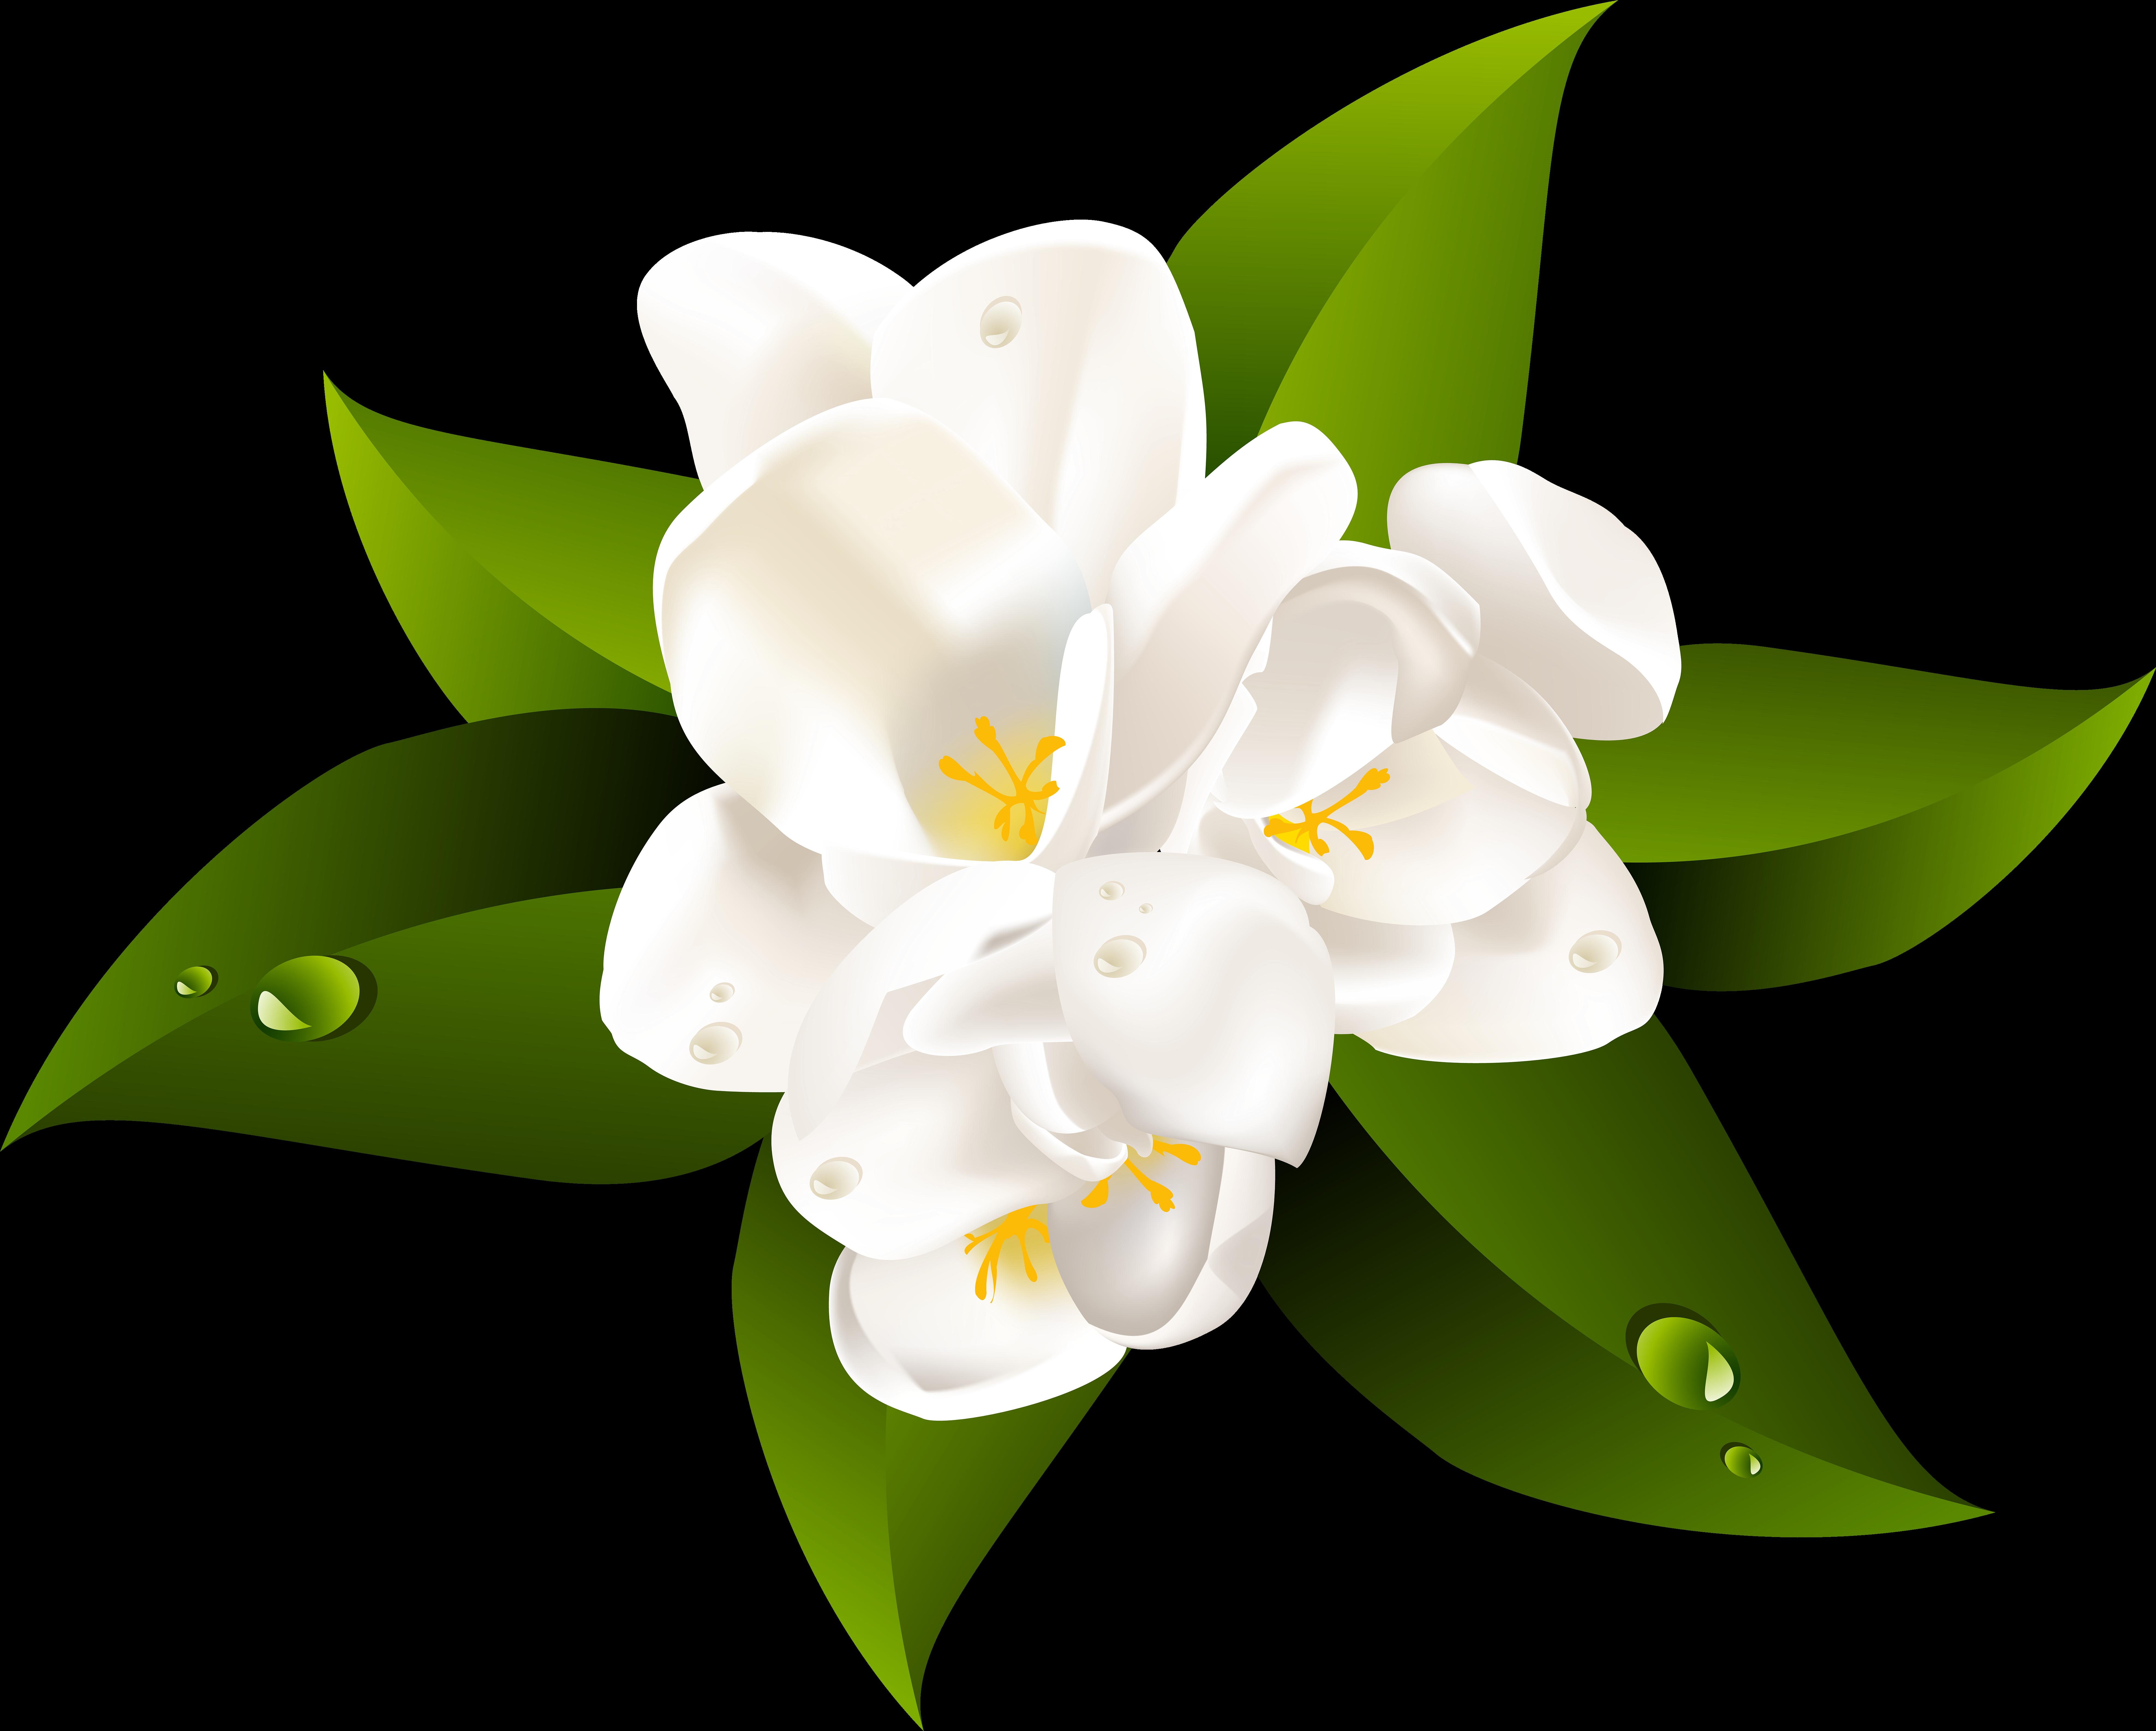 Transparent cartoon jing fm. Lily clipart blue jasmine